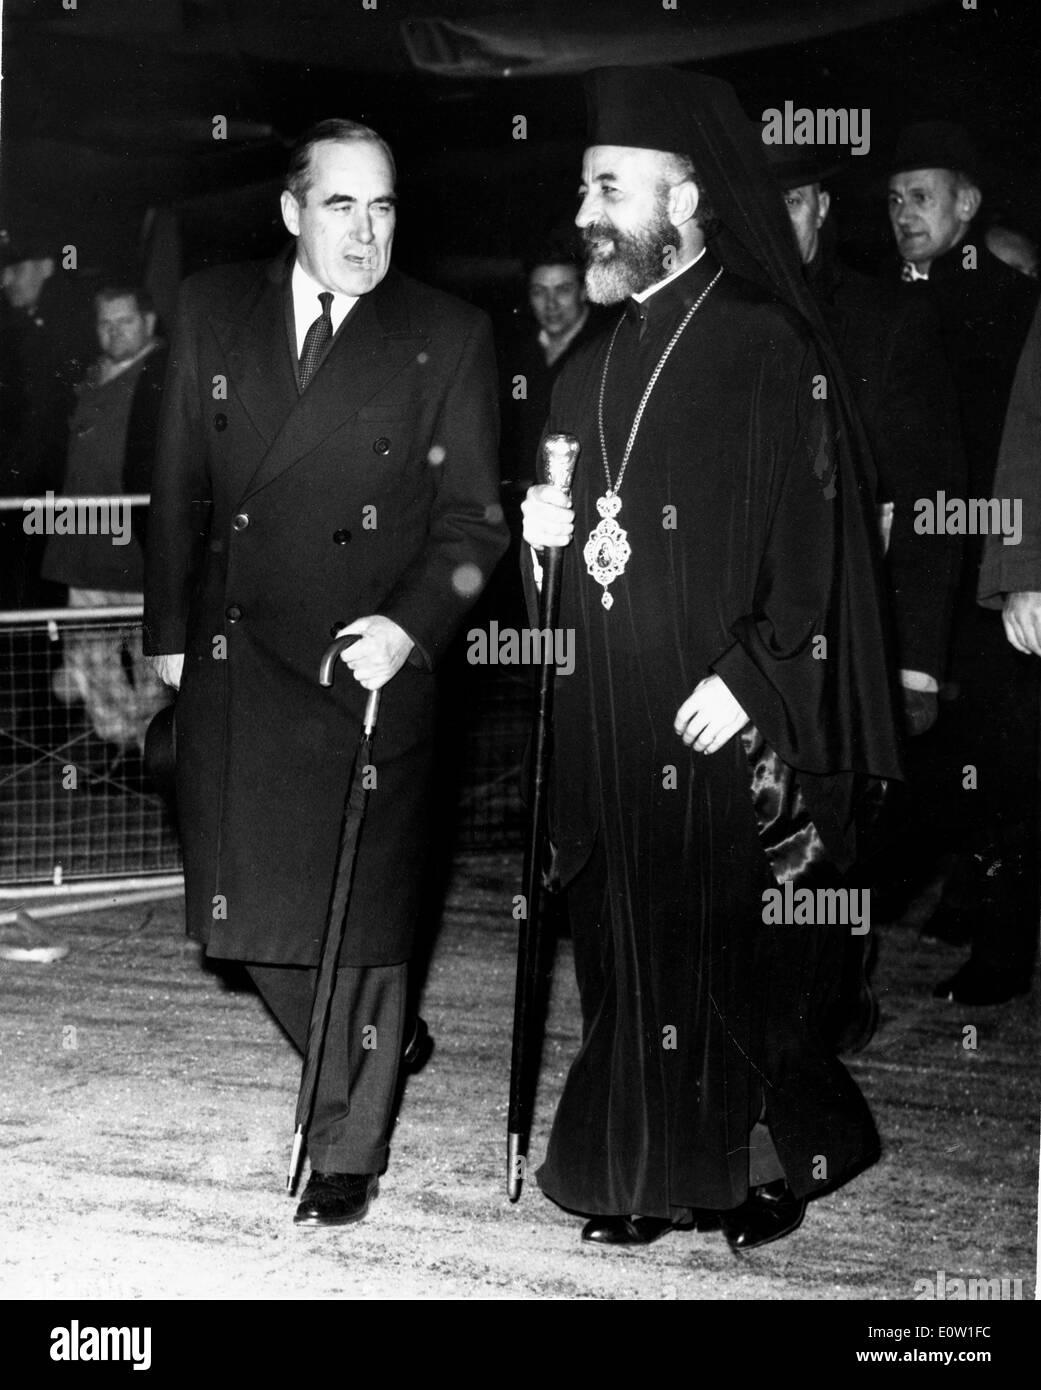 Archbishop Makarios III greeted by Hugh Foot - Stock Image